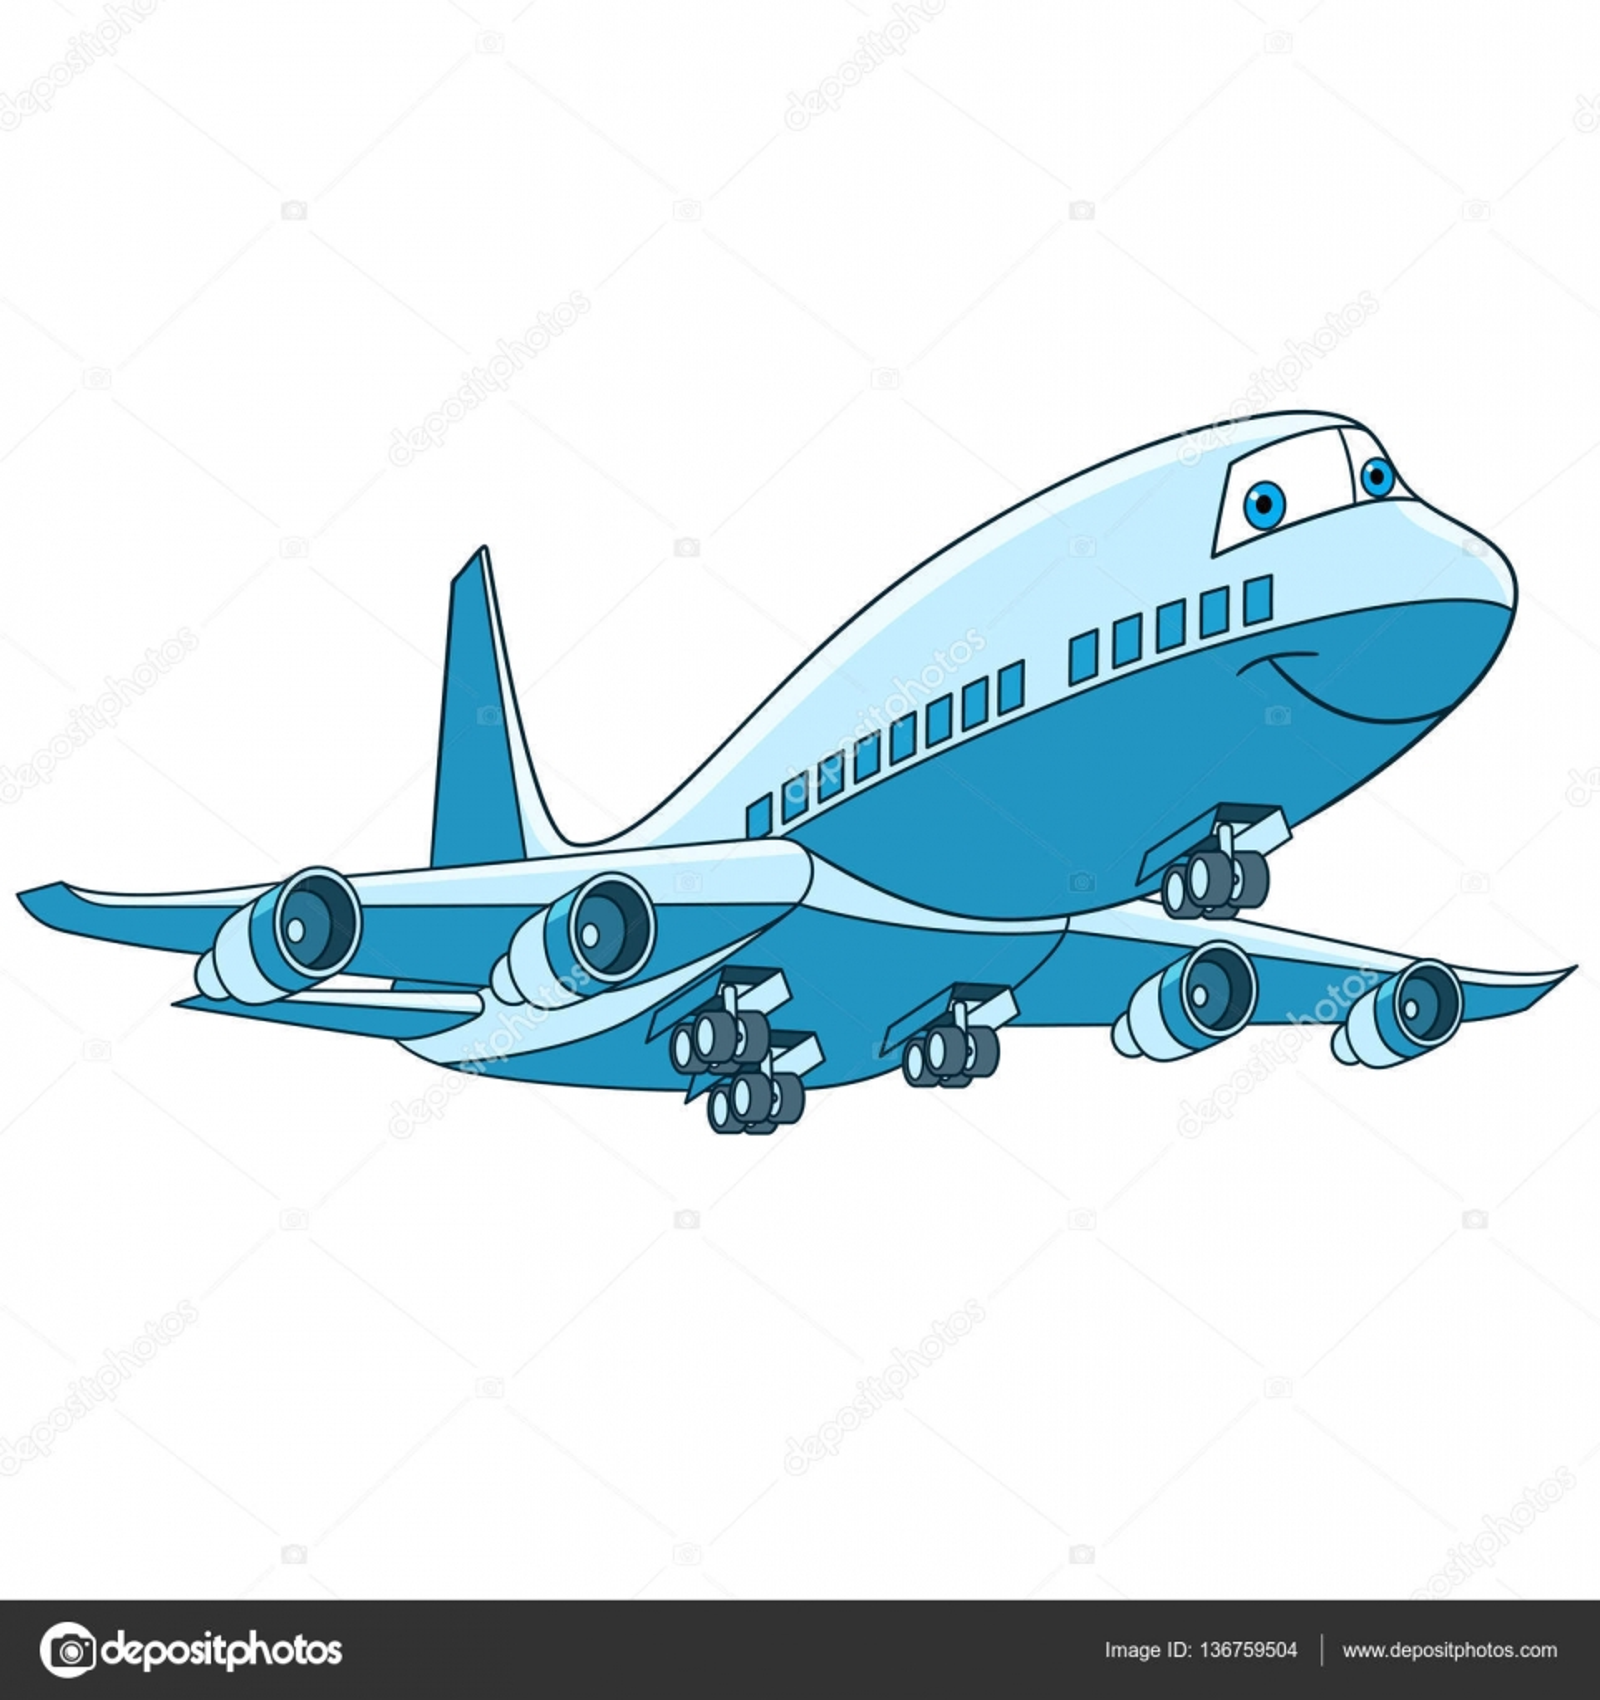 Cartoon vliegtuig vliegtuigen — stockvector sybirko